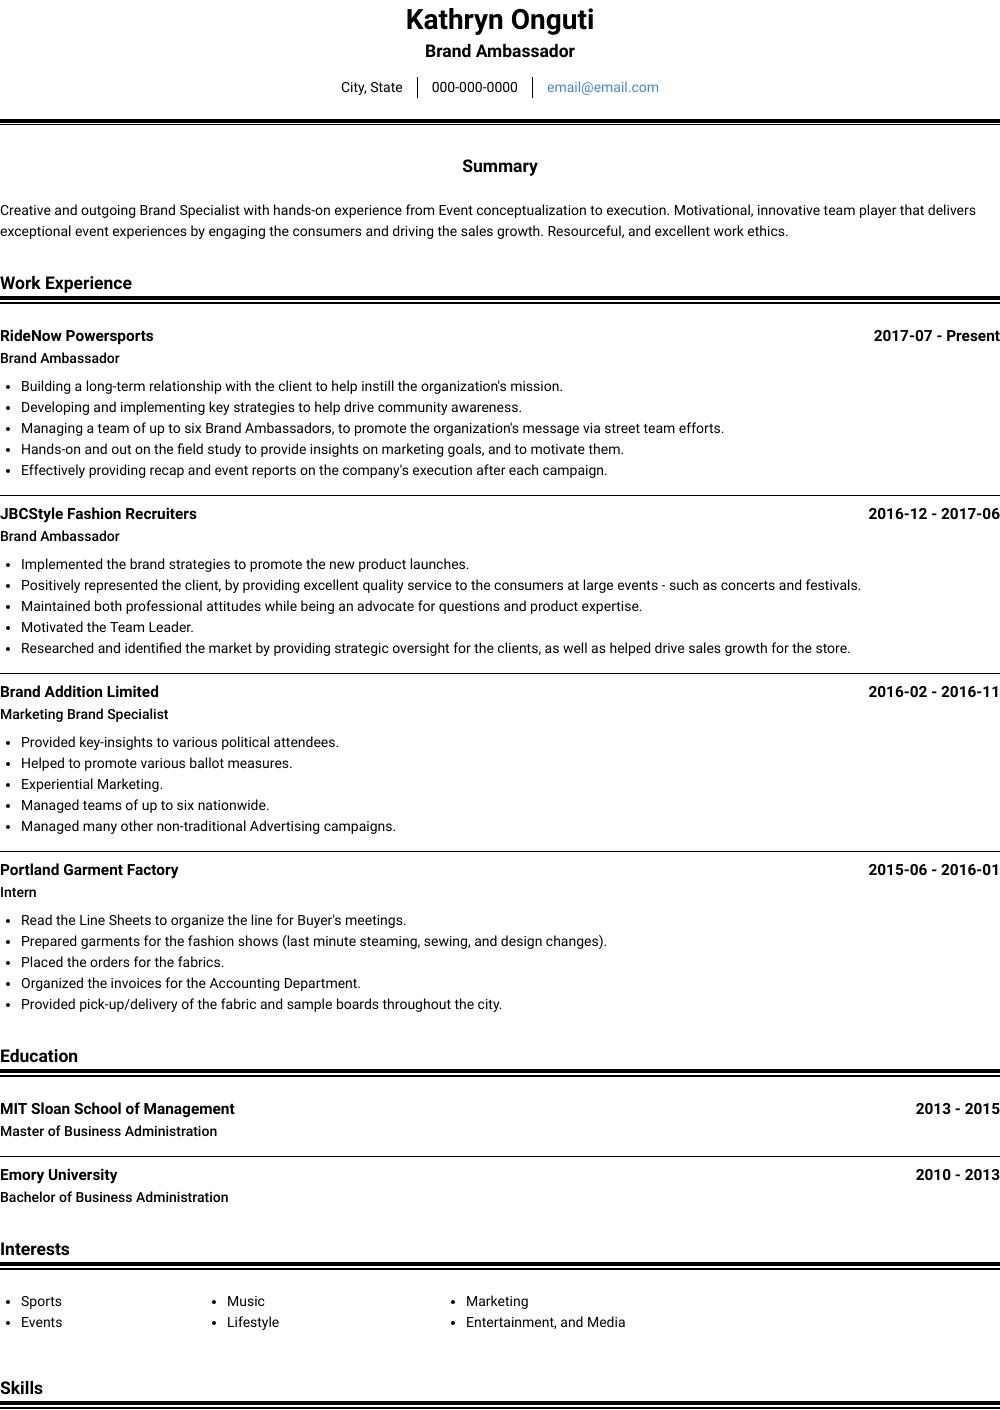 cv resume writing